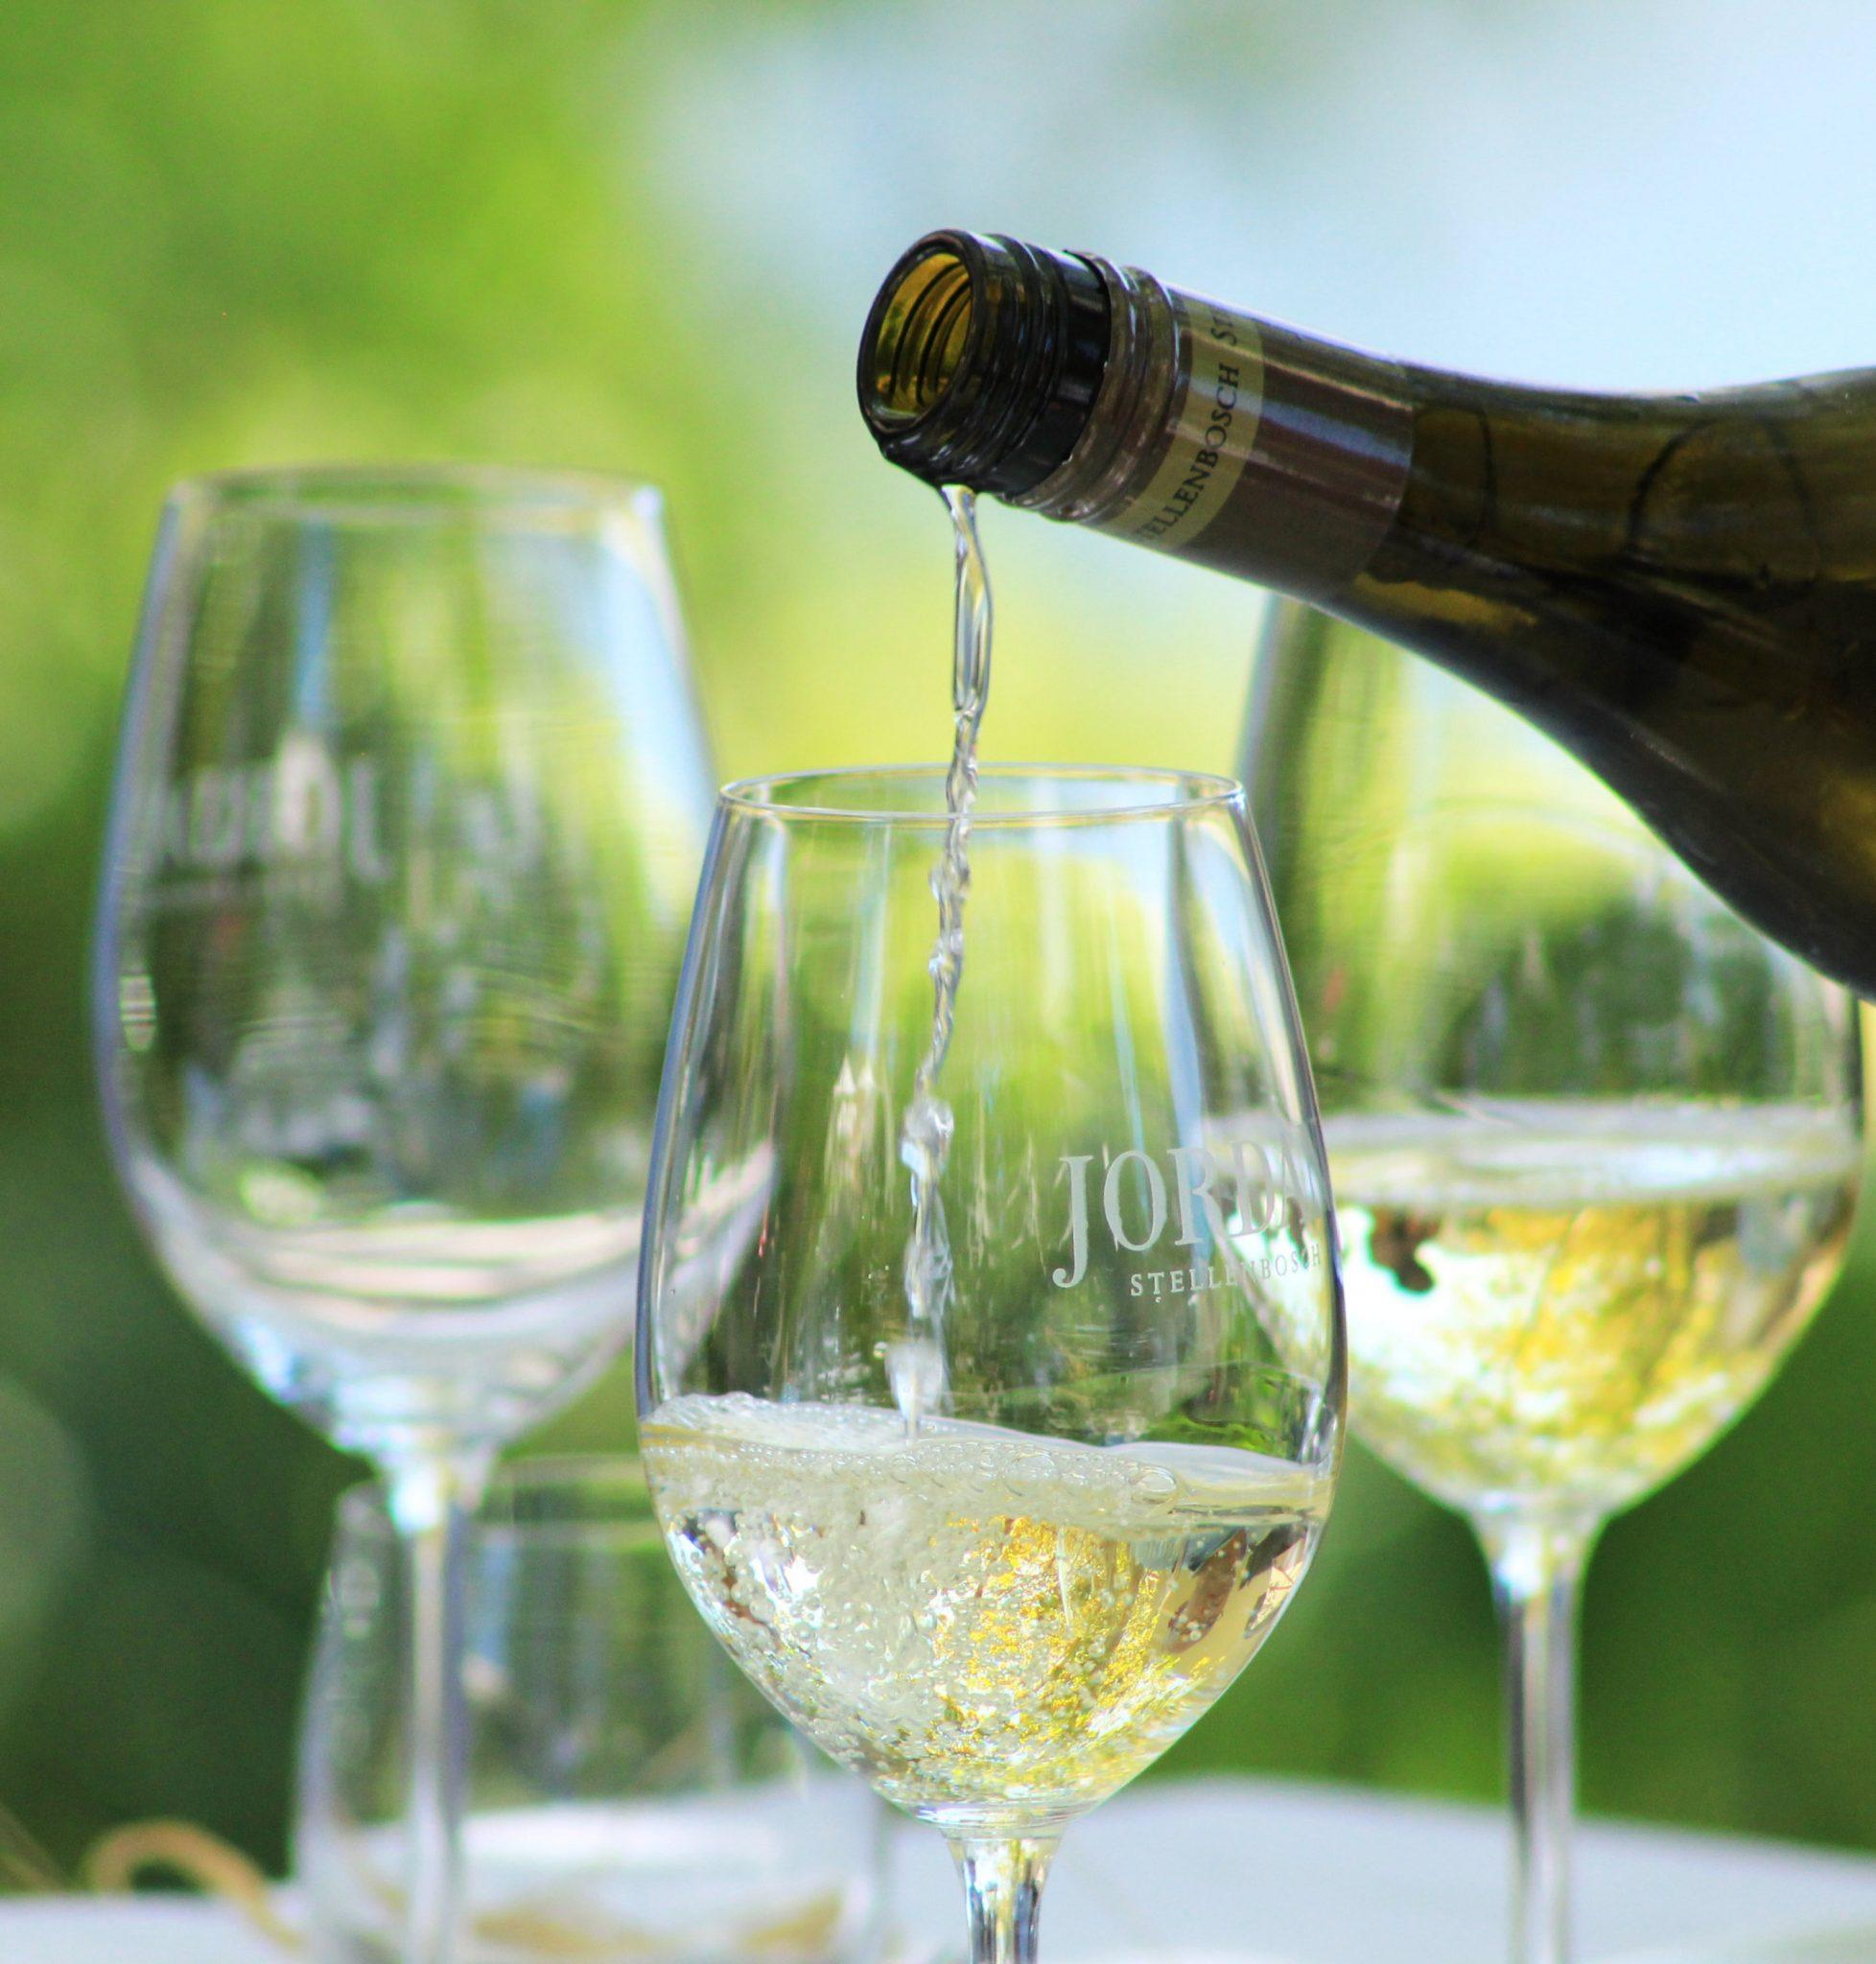 Jordan Wine Tastings Sonia Cabano blog eatdrinkcapetown